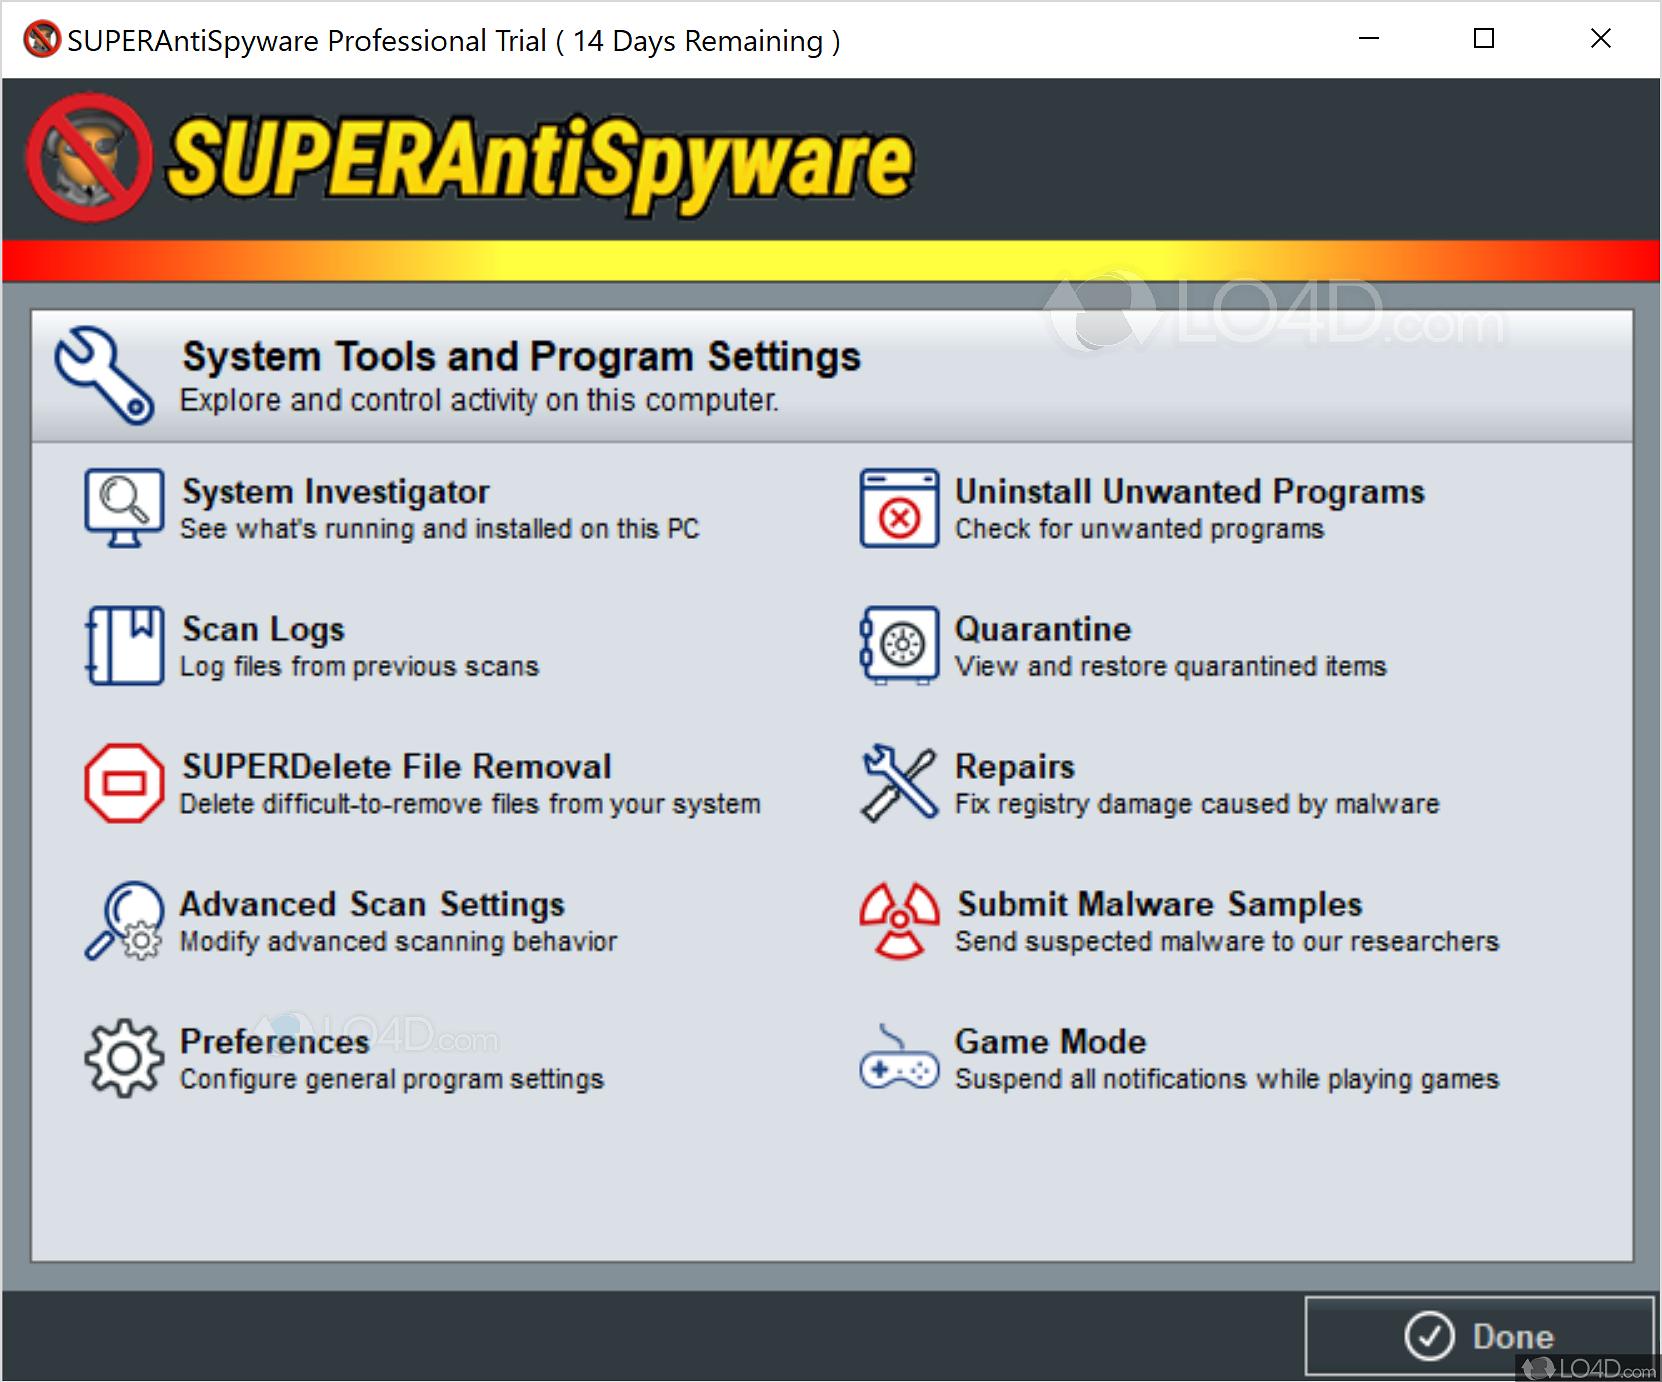 SUPERAntiSpyware Pro - Screenshots